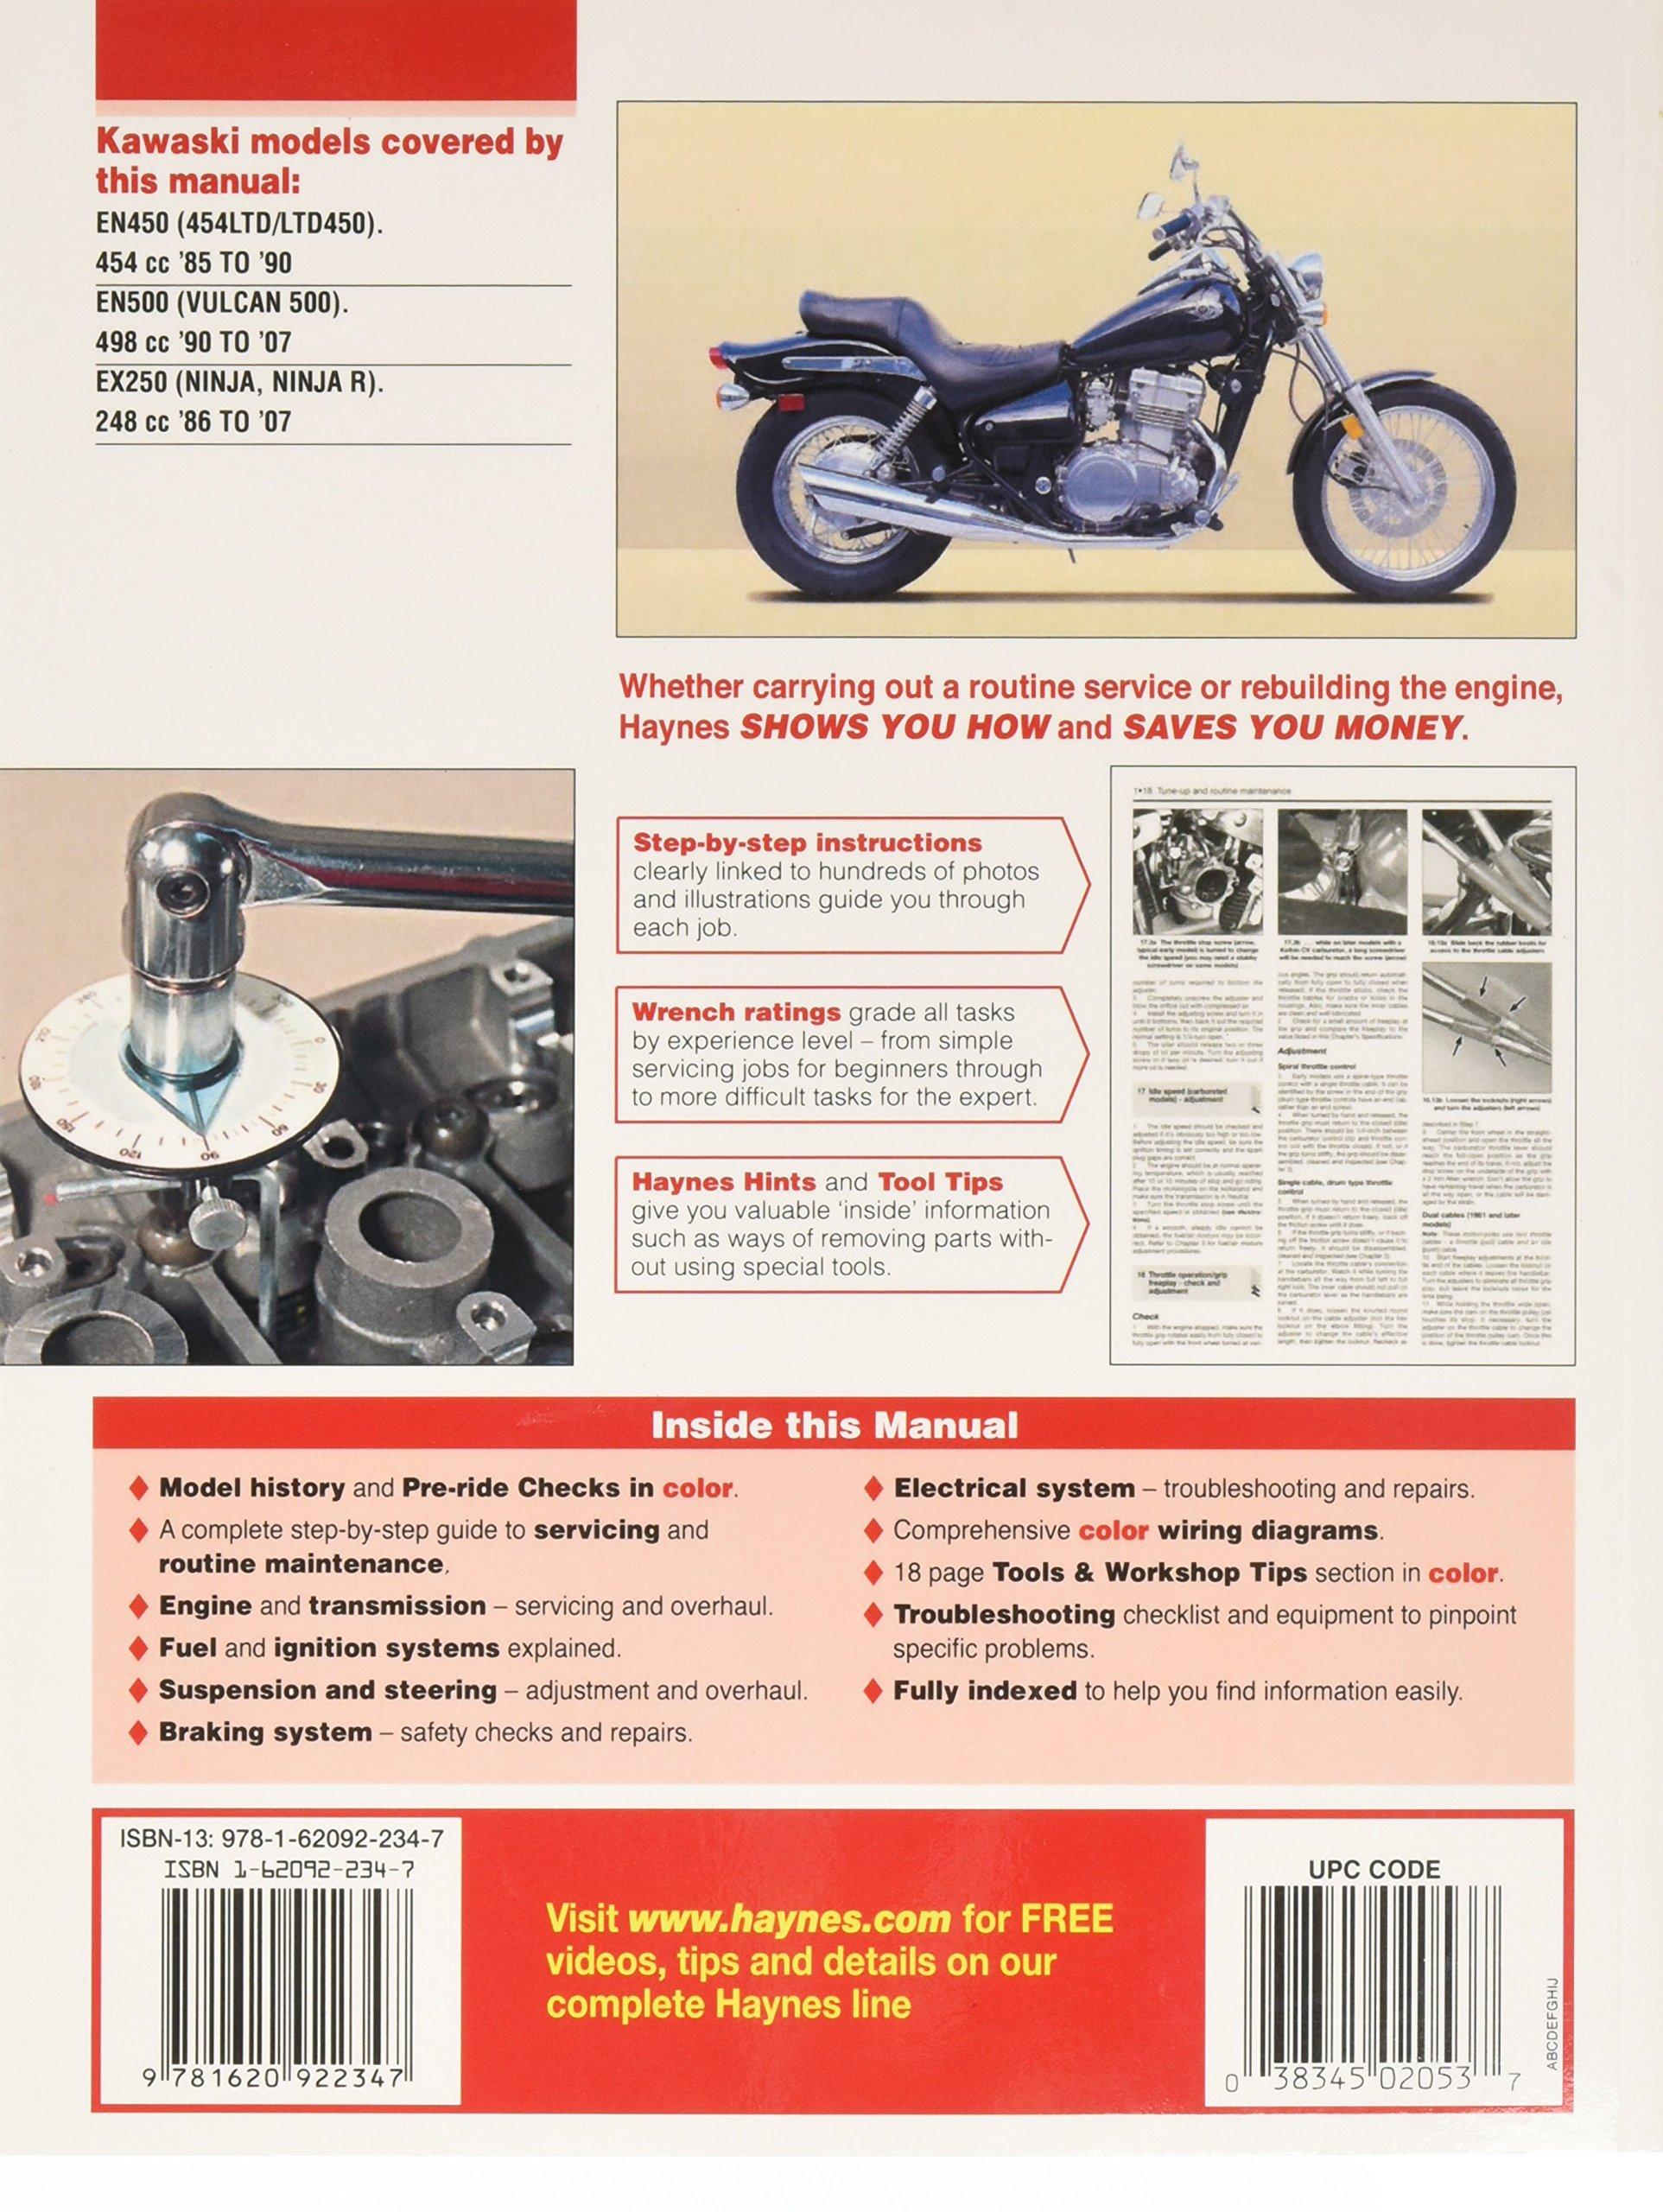 Kawasaki En450 And 500 Owners Workshop Manual Haynes Wiring Diagram Manuals Alan Harold Ahlstrand J H 9781563925504 Books